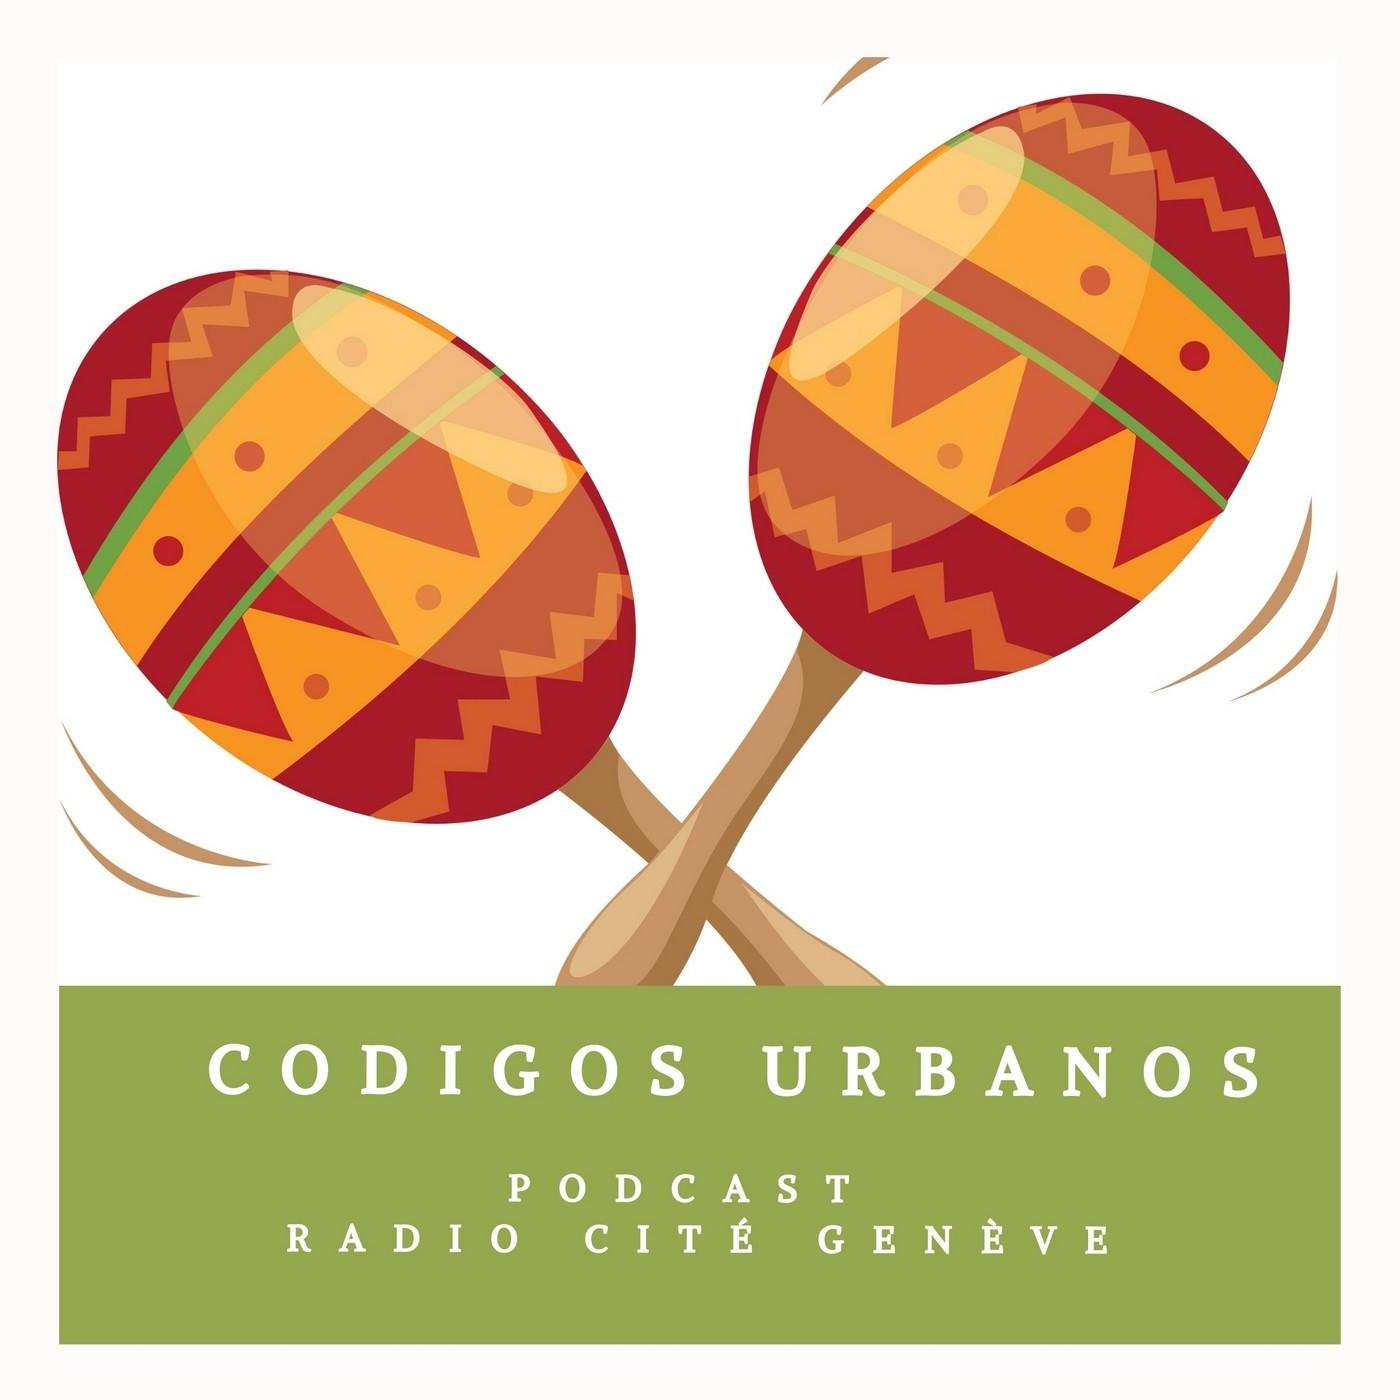 Codigos Urbanos - 02/03/21